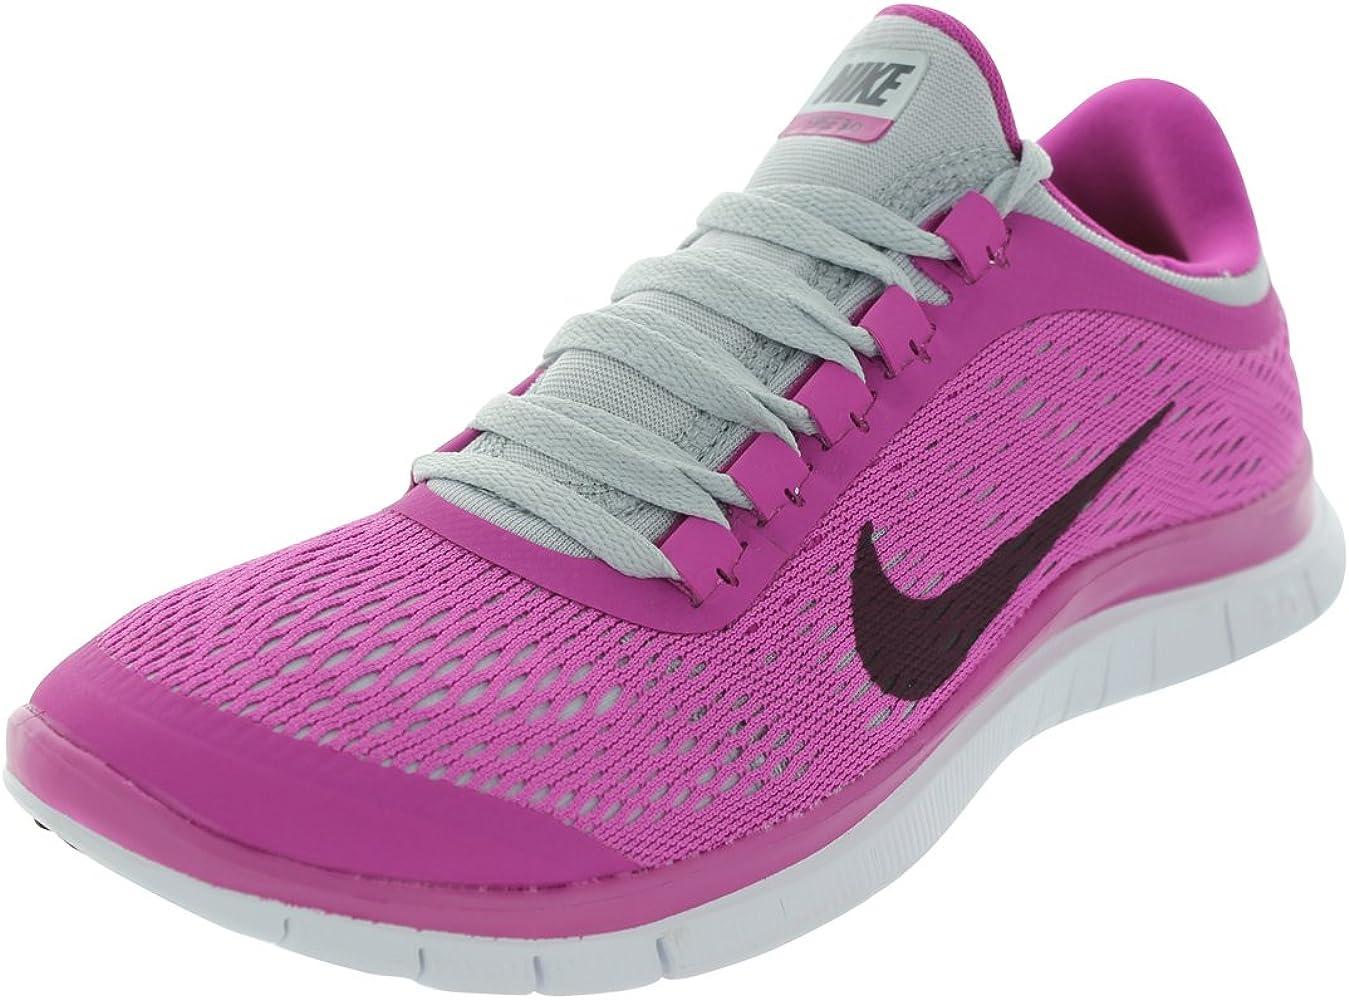 malicioso Barón persona que practica jogging  Amazon.com   Nike Women's Free 3.0 V5 Club Pink/Grdrn/Pr Pltmn ...